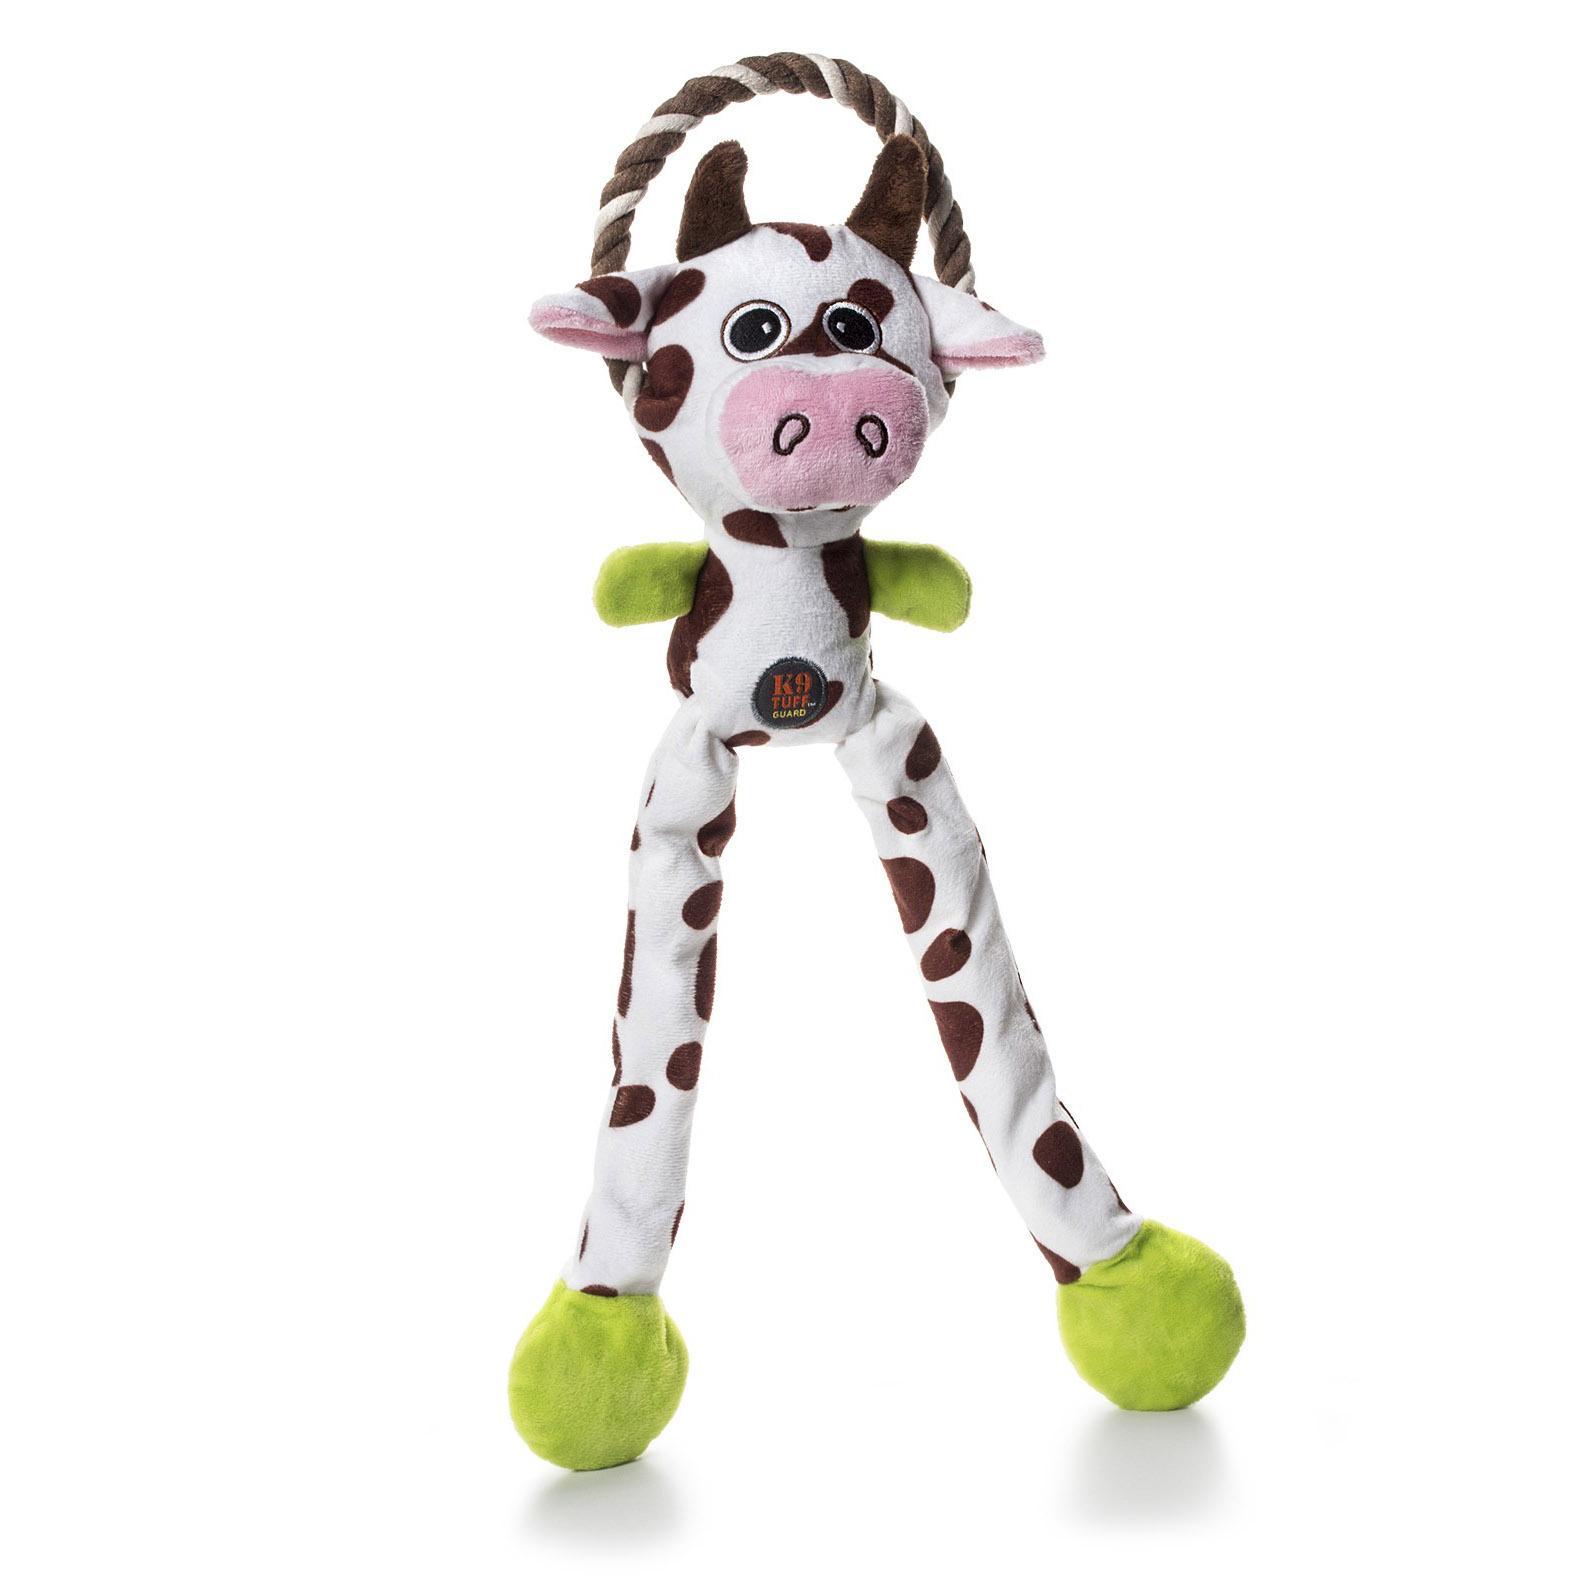 Charming Thunda Blasters Dog Toy - Leggy Cow